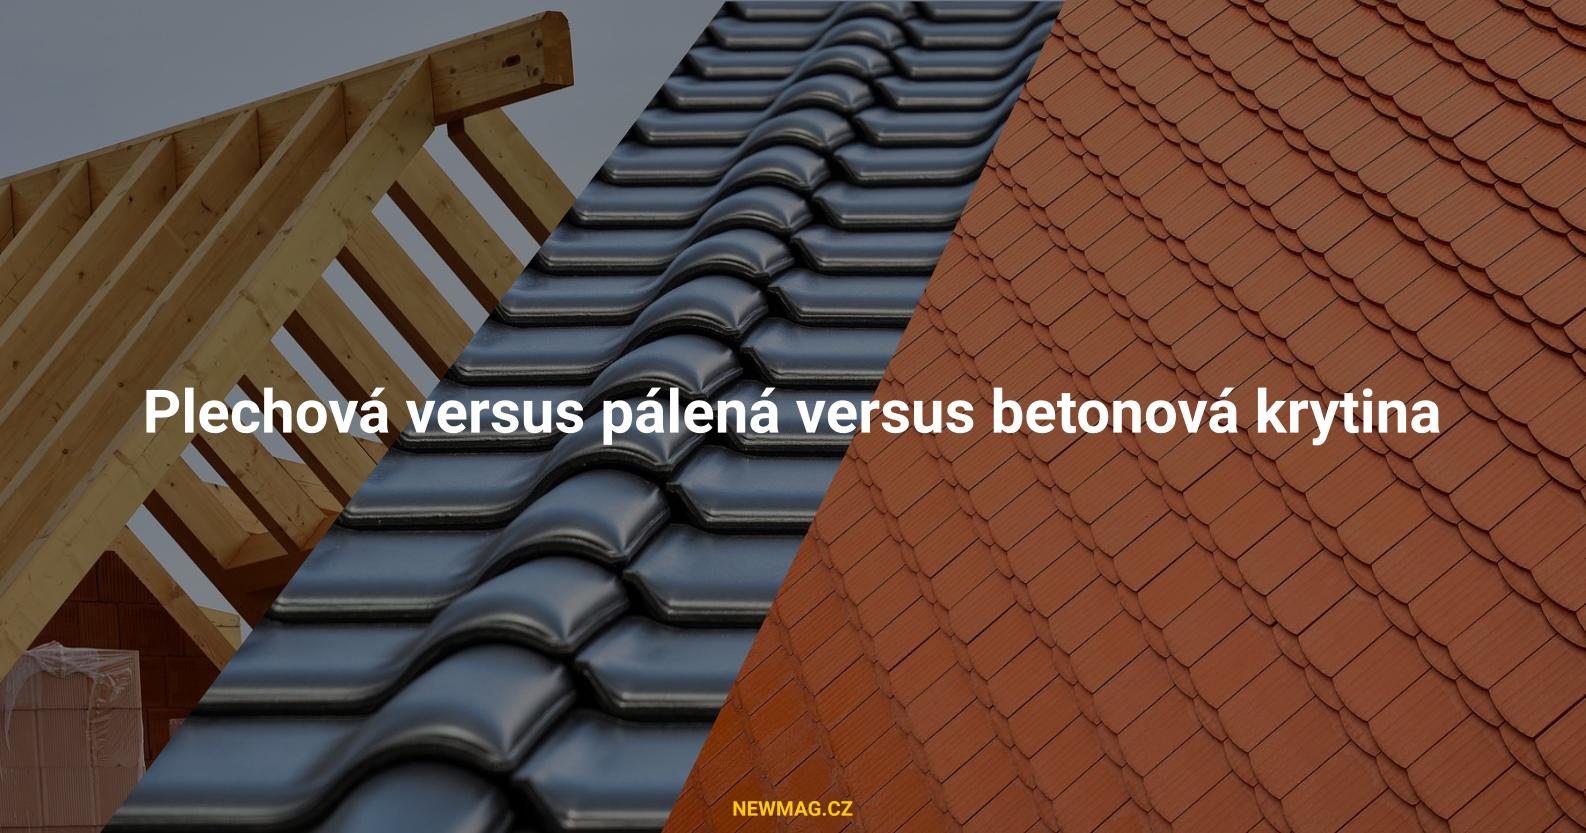 Plechová versus pálená versus betonová krytina